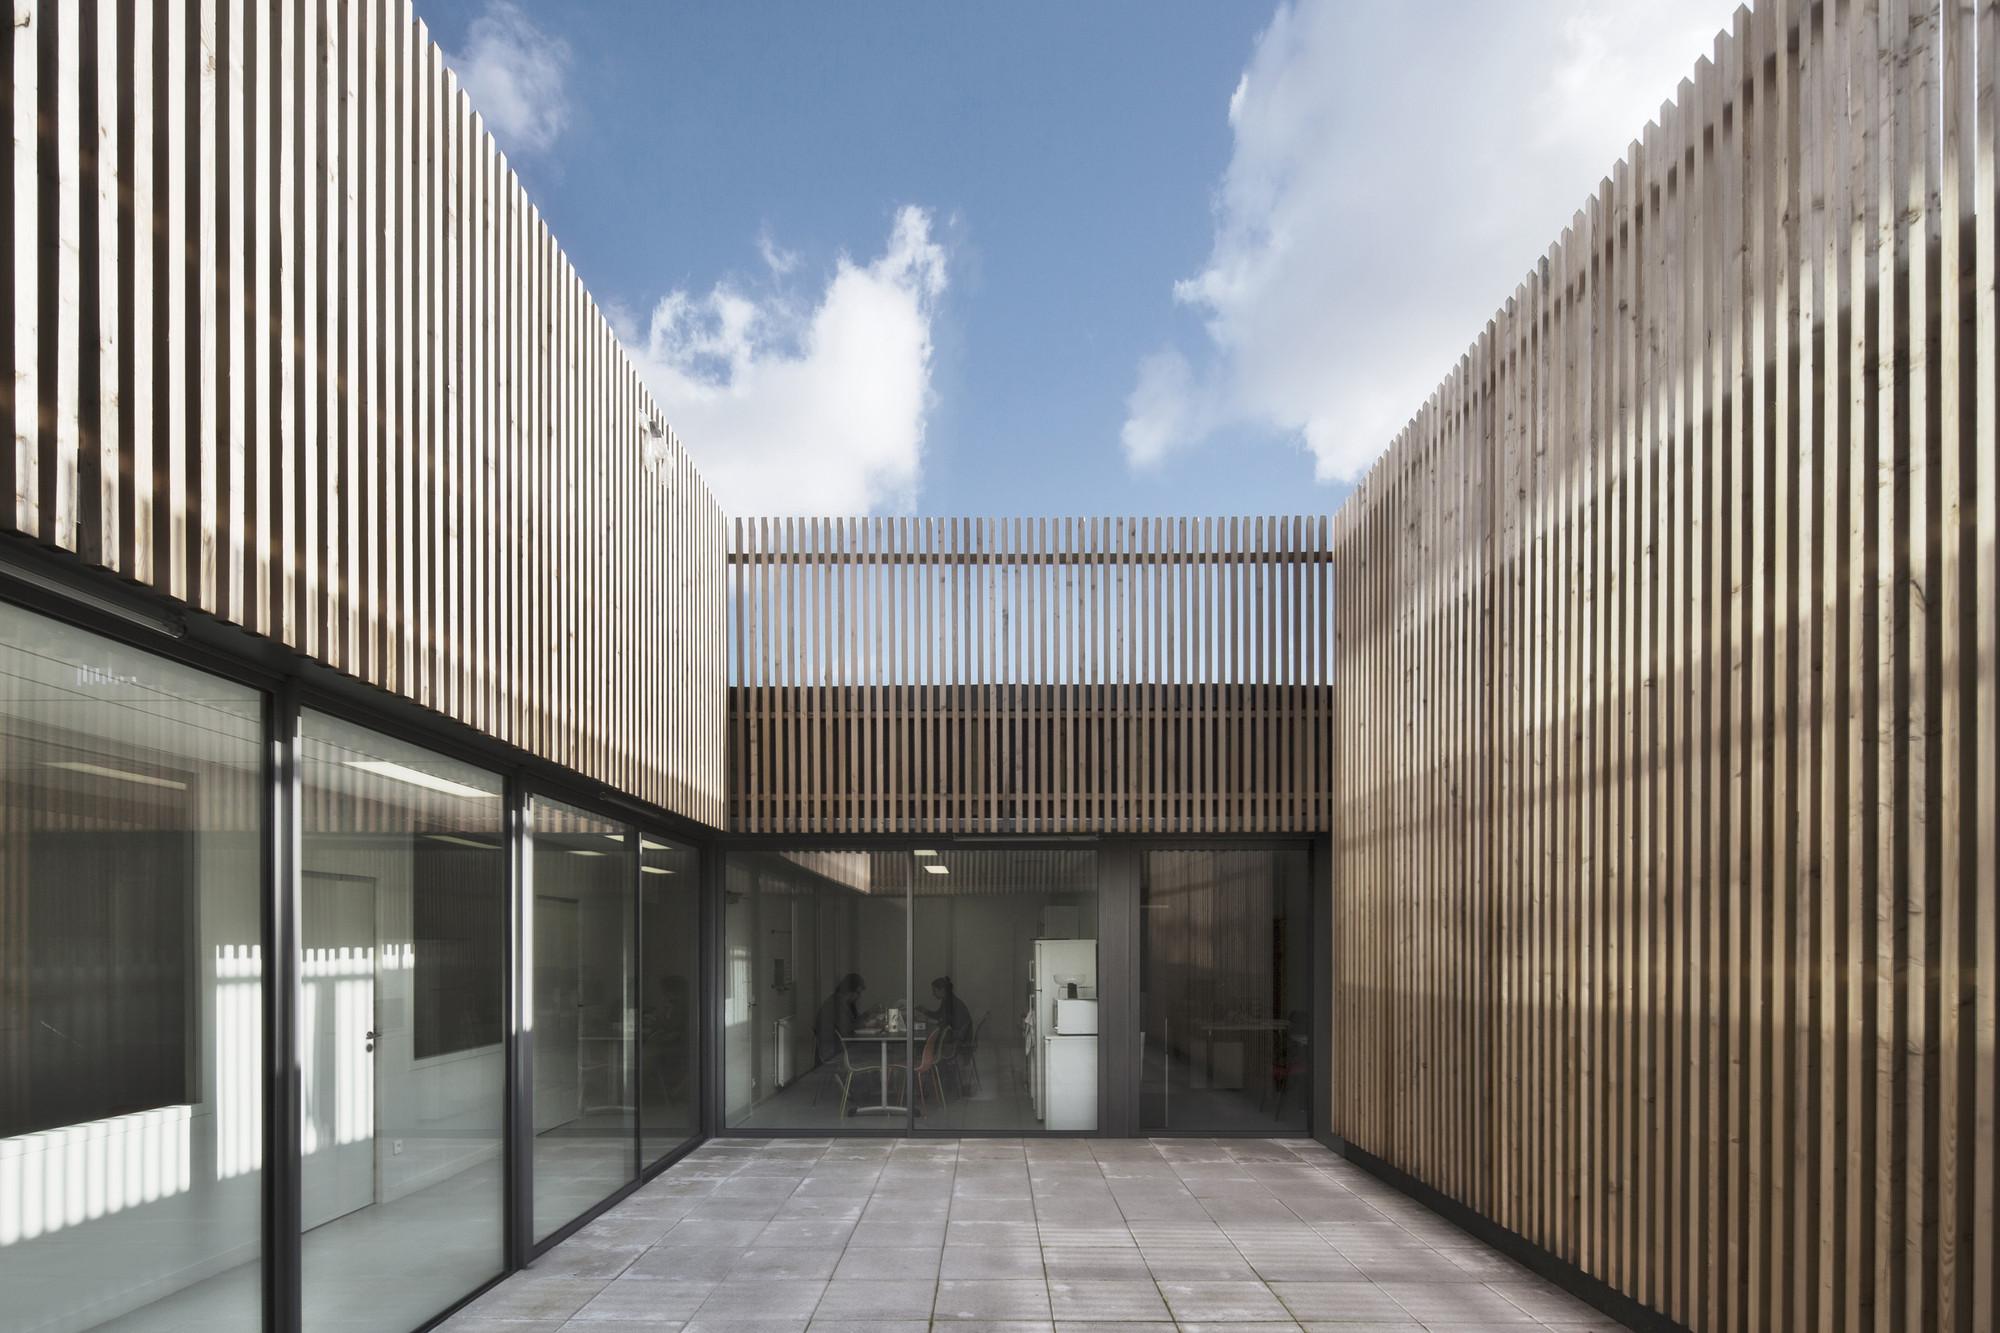 saint denis archives building antonini darmon architectes archdaily. Black Bedroom Furniture Sets. Home Design Ideas